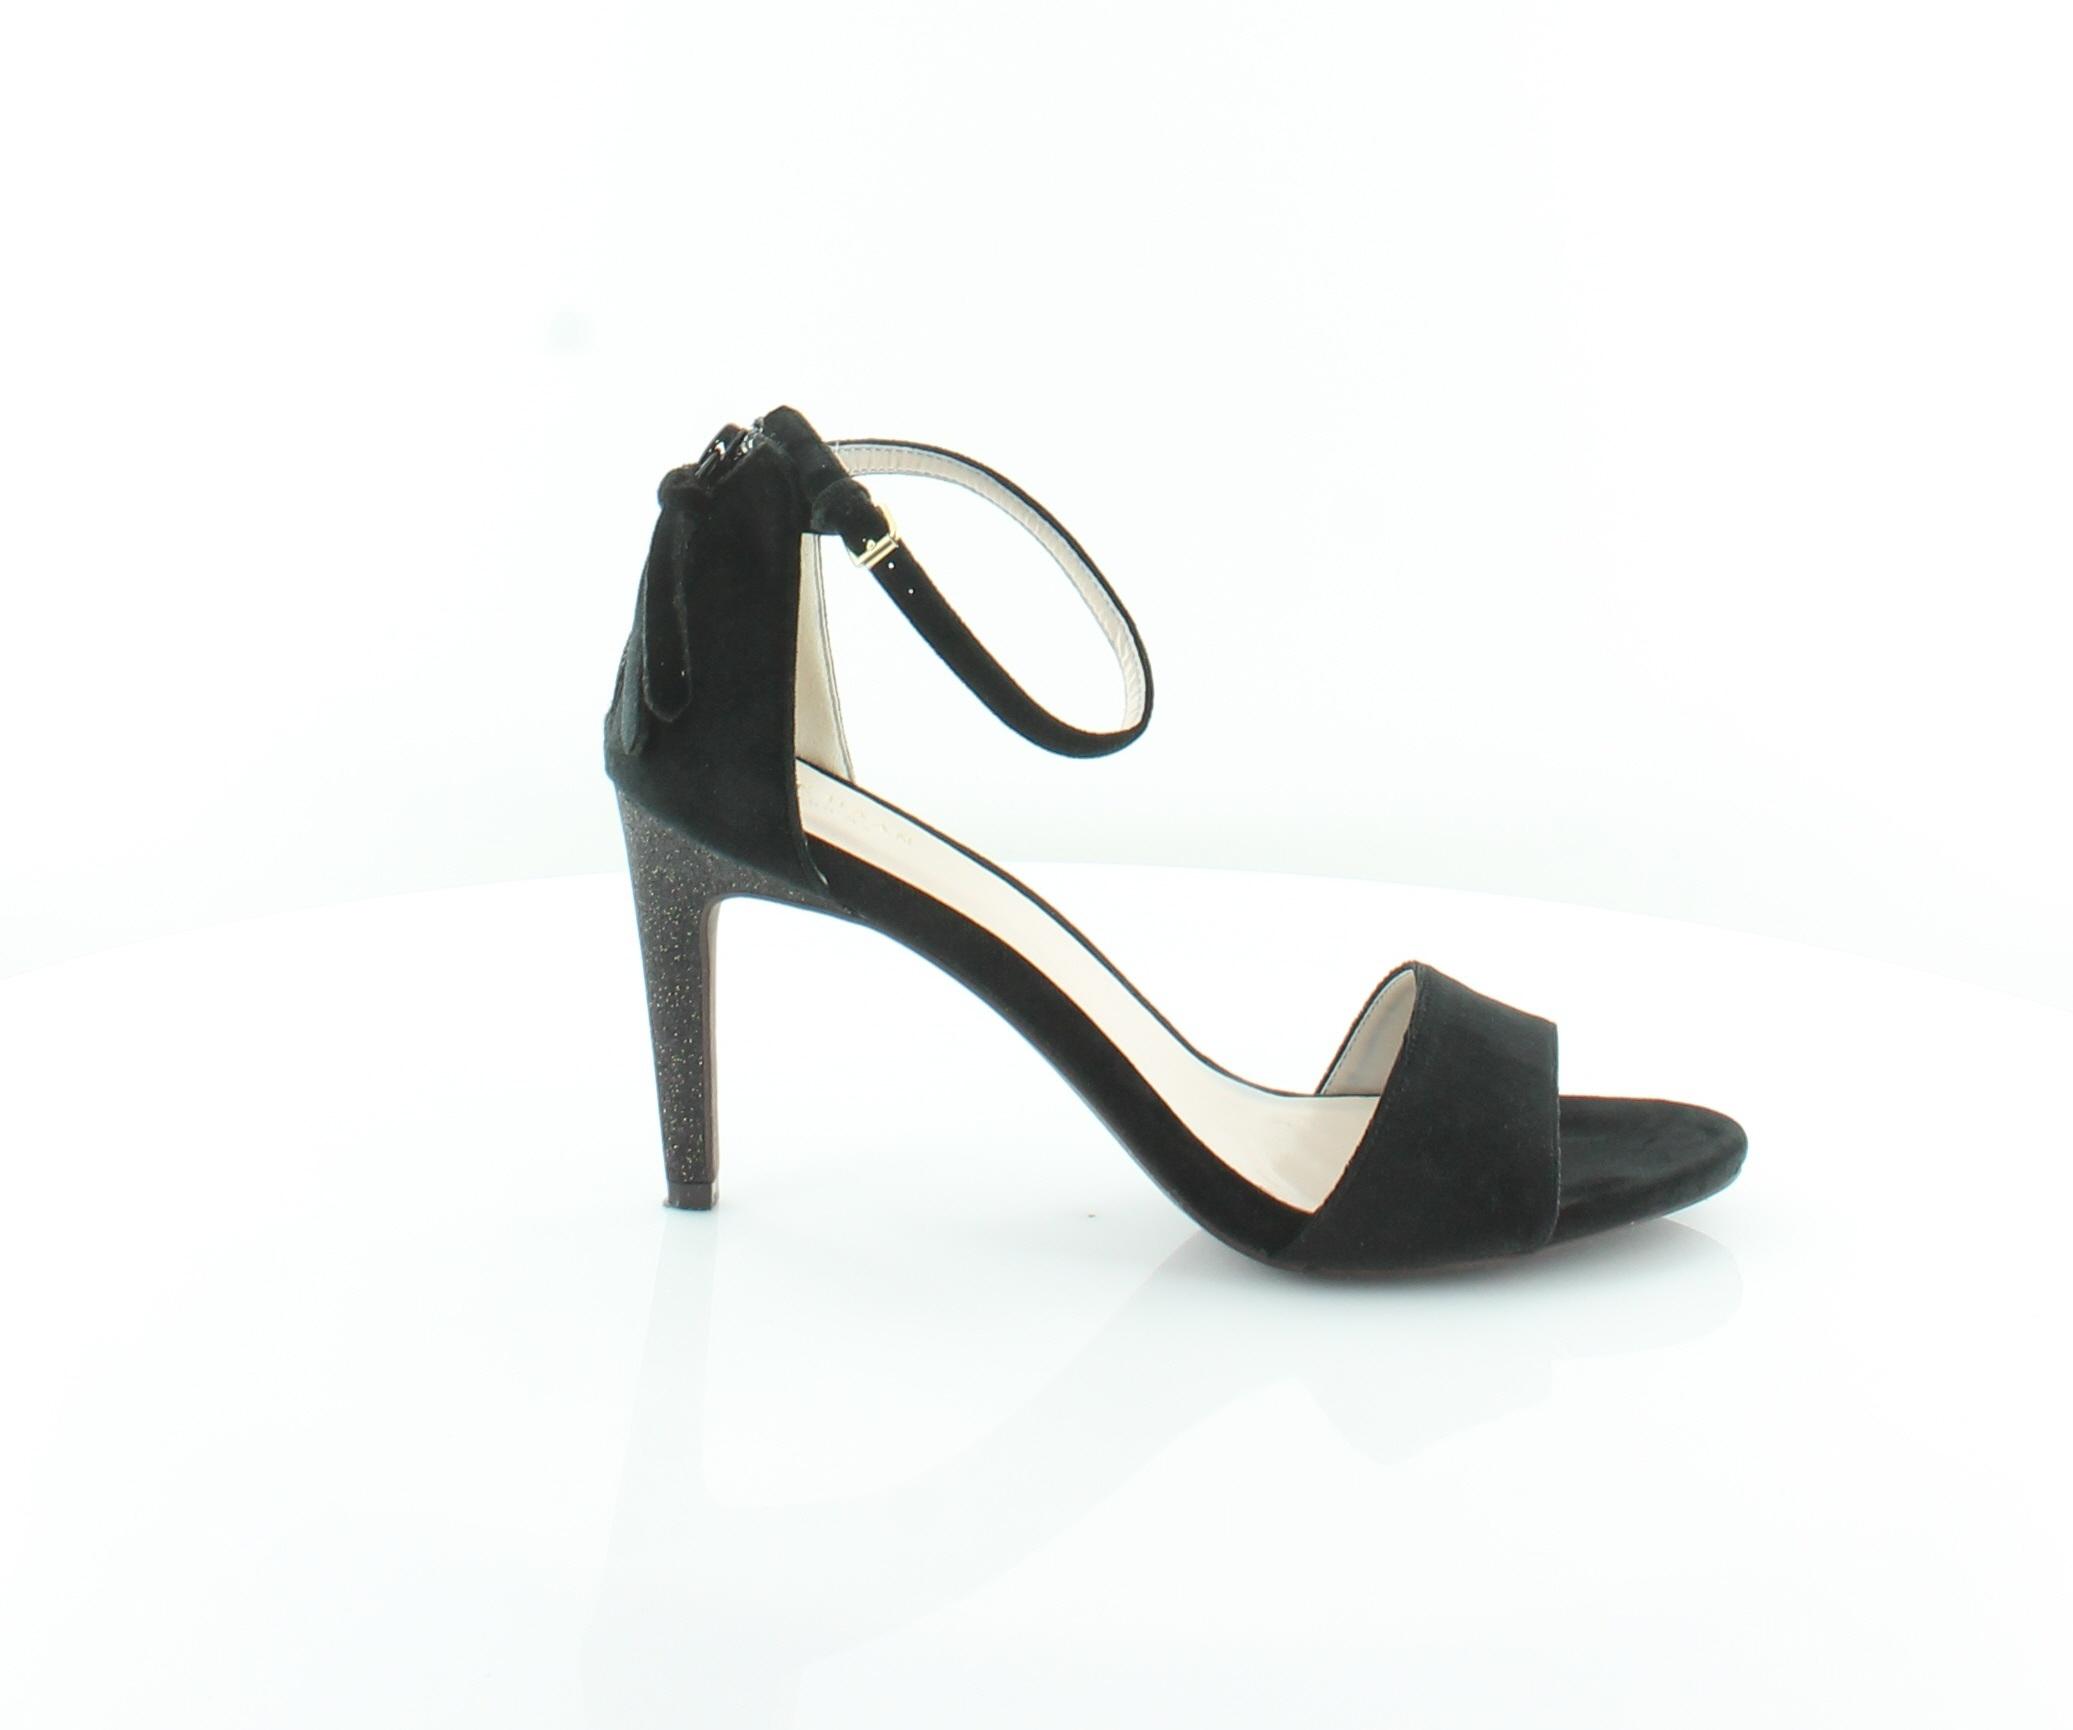 ba6282d2536 Cole Haan Clara Grand Black Womens Shoes Size 9 M Sandals MSRP  170 ...